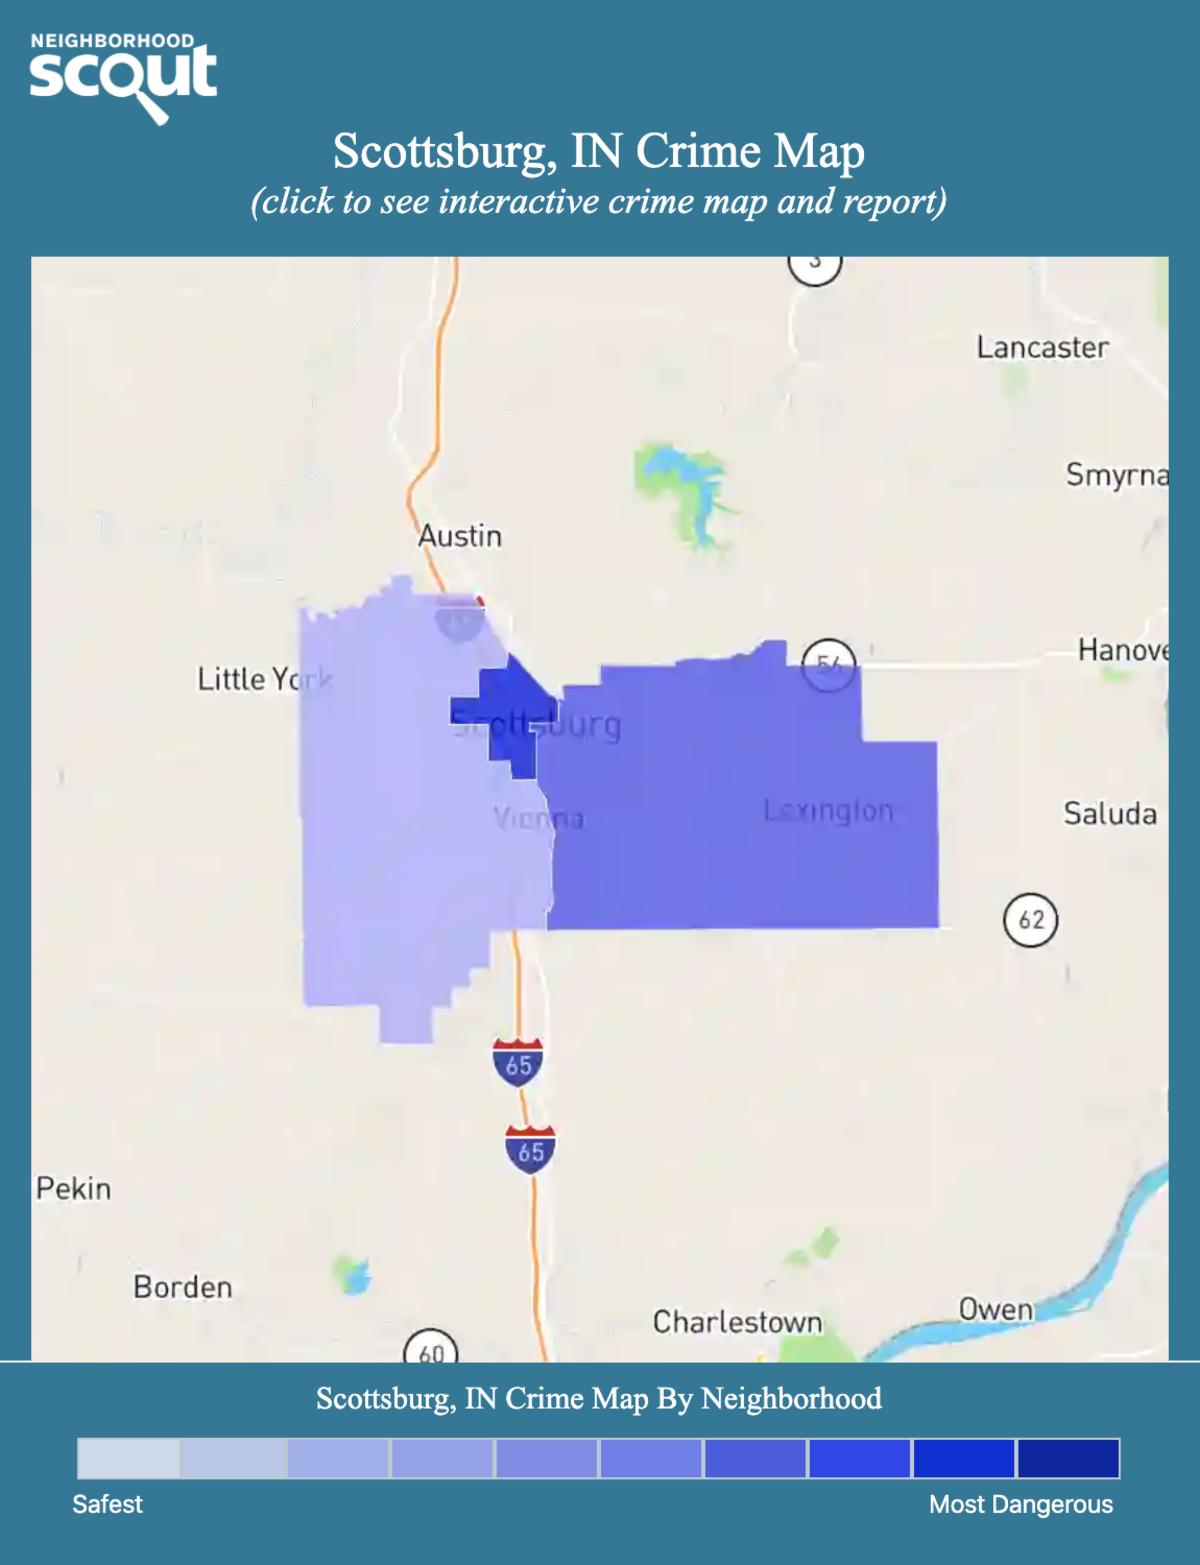 Scottsburg, Indiana crime map